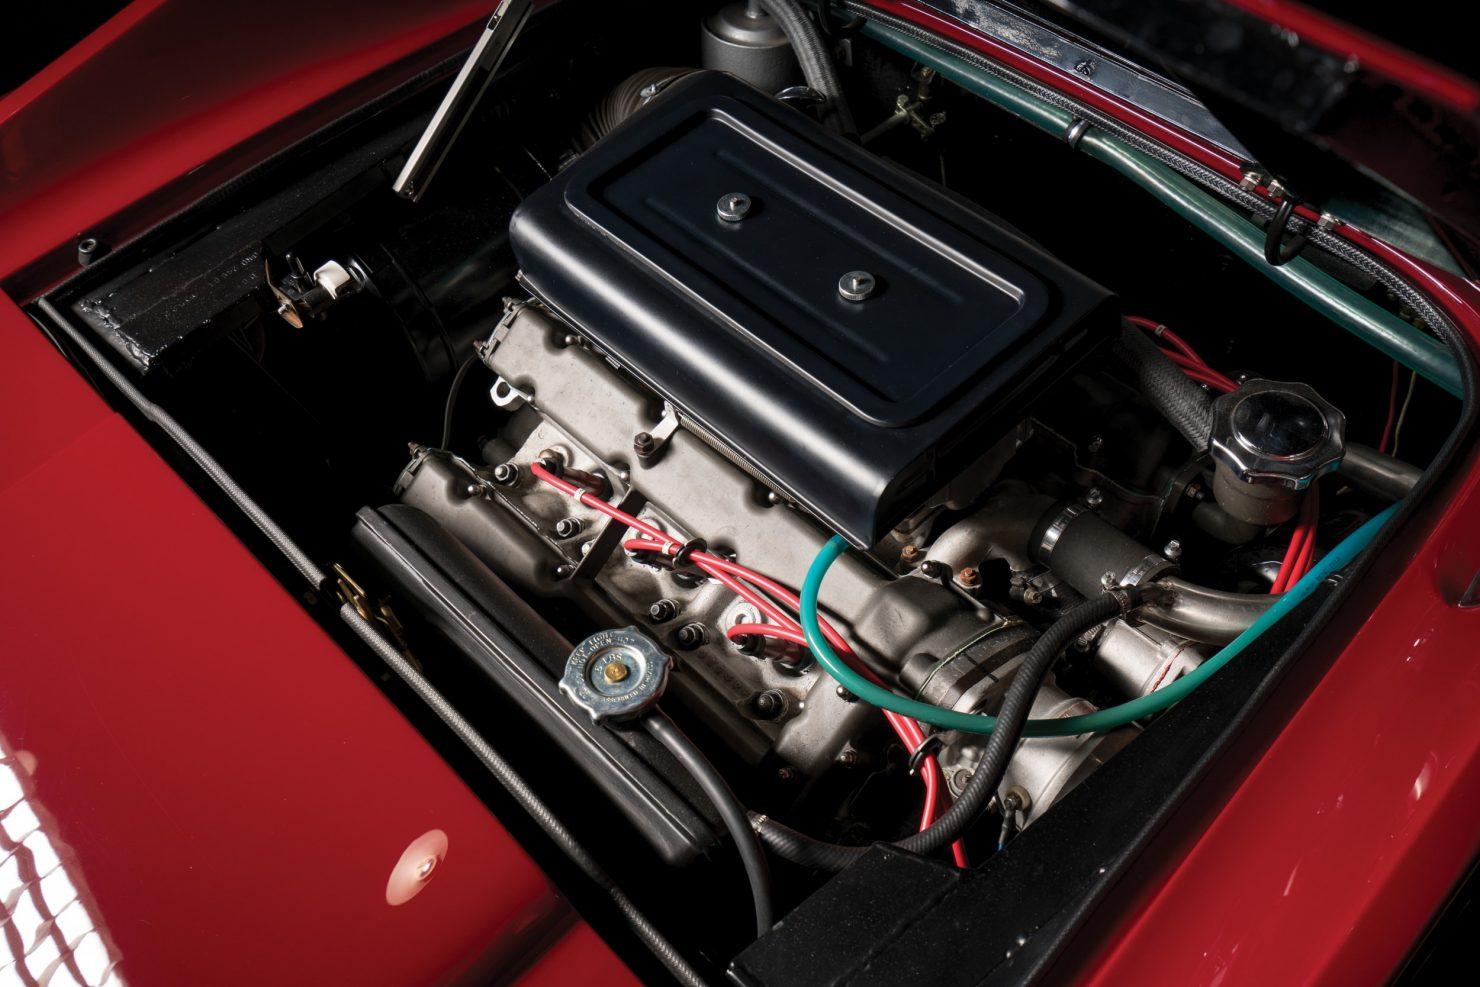 ferrari dino 246 23 1480x987 - 1969 Ferrari Dino 246 GT